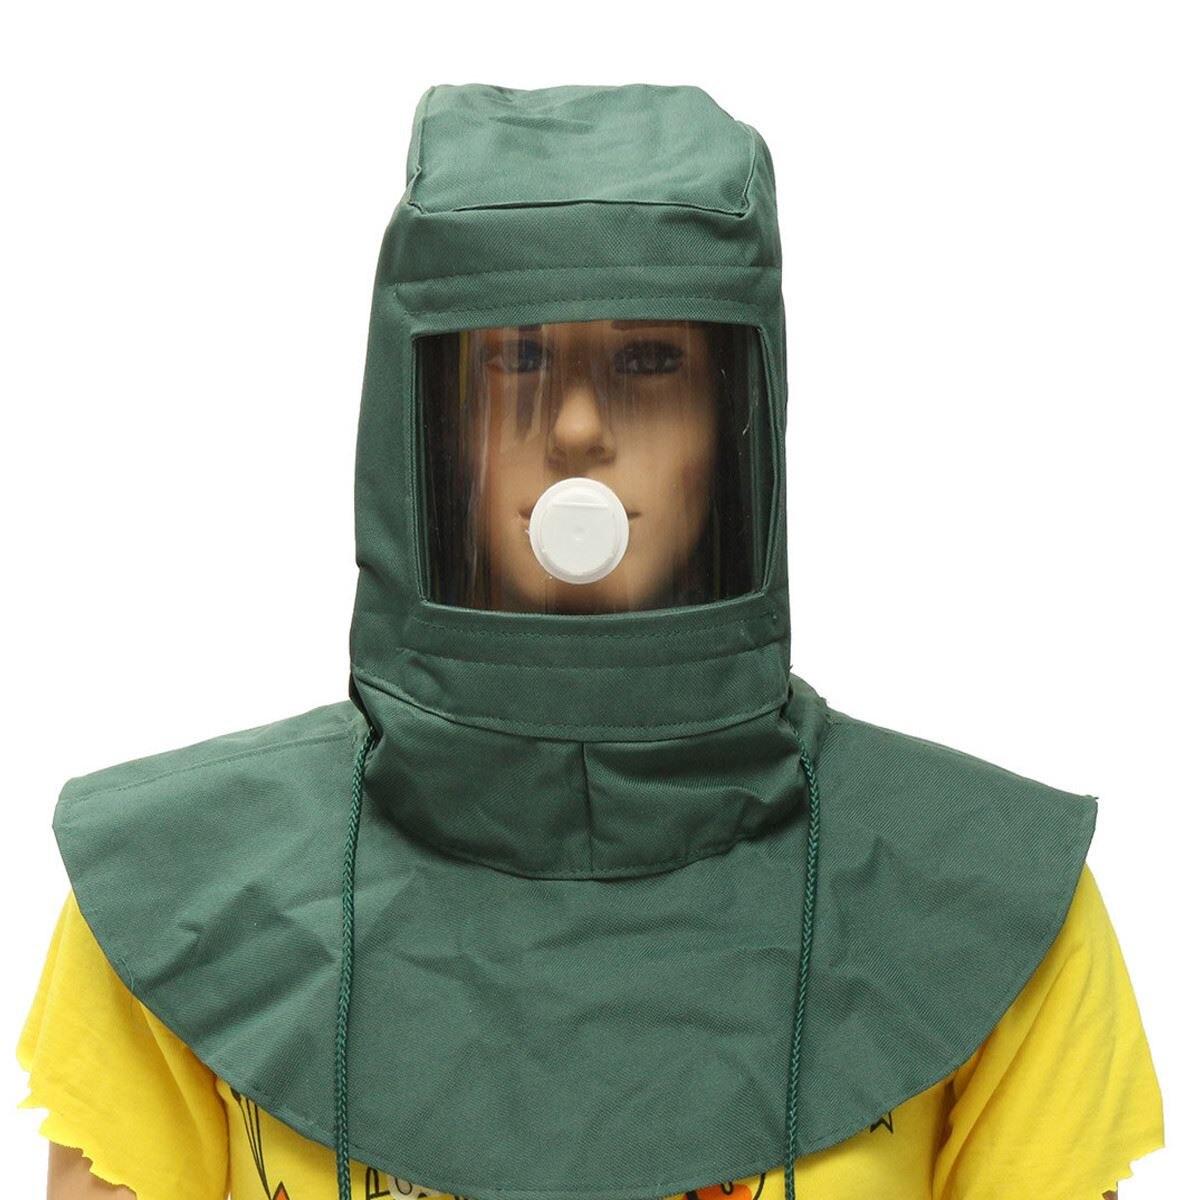 Nuovo Sabbiatura Hood Sand Sabbia Abrasiva Colpo Sabbia Blaster Maschera Polvere Protettiva Tool